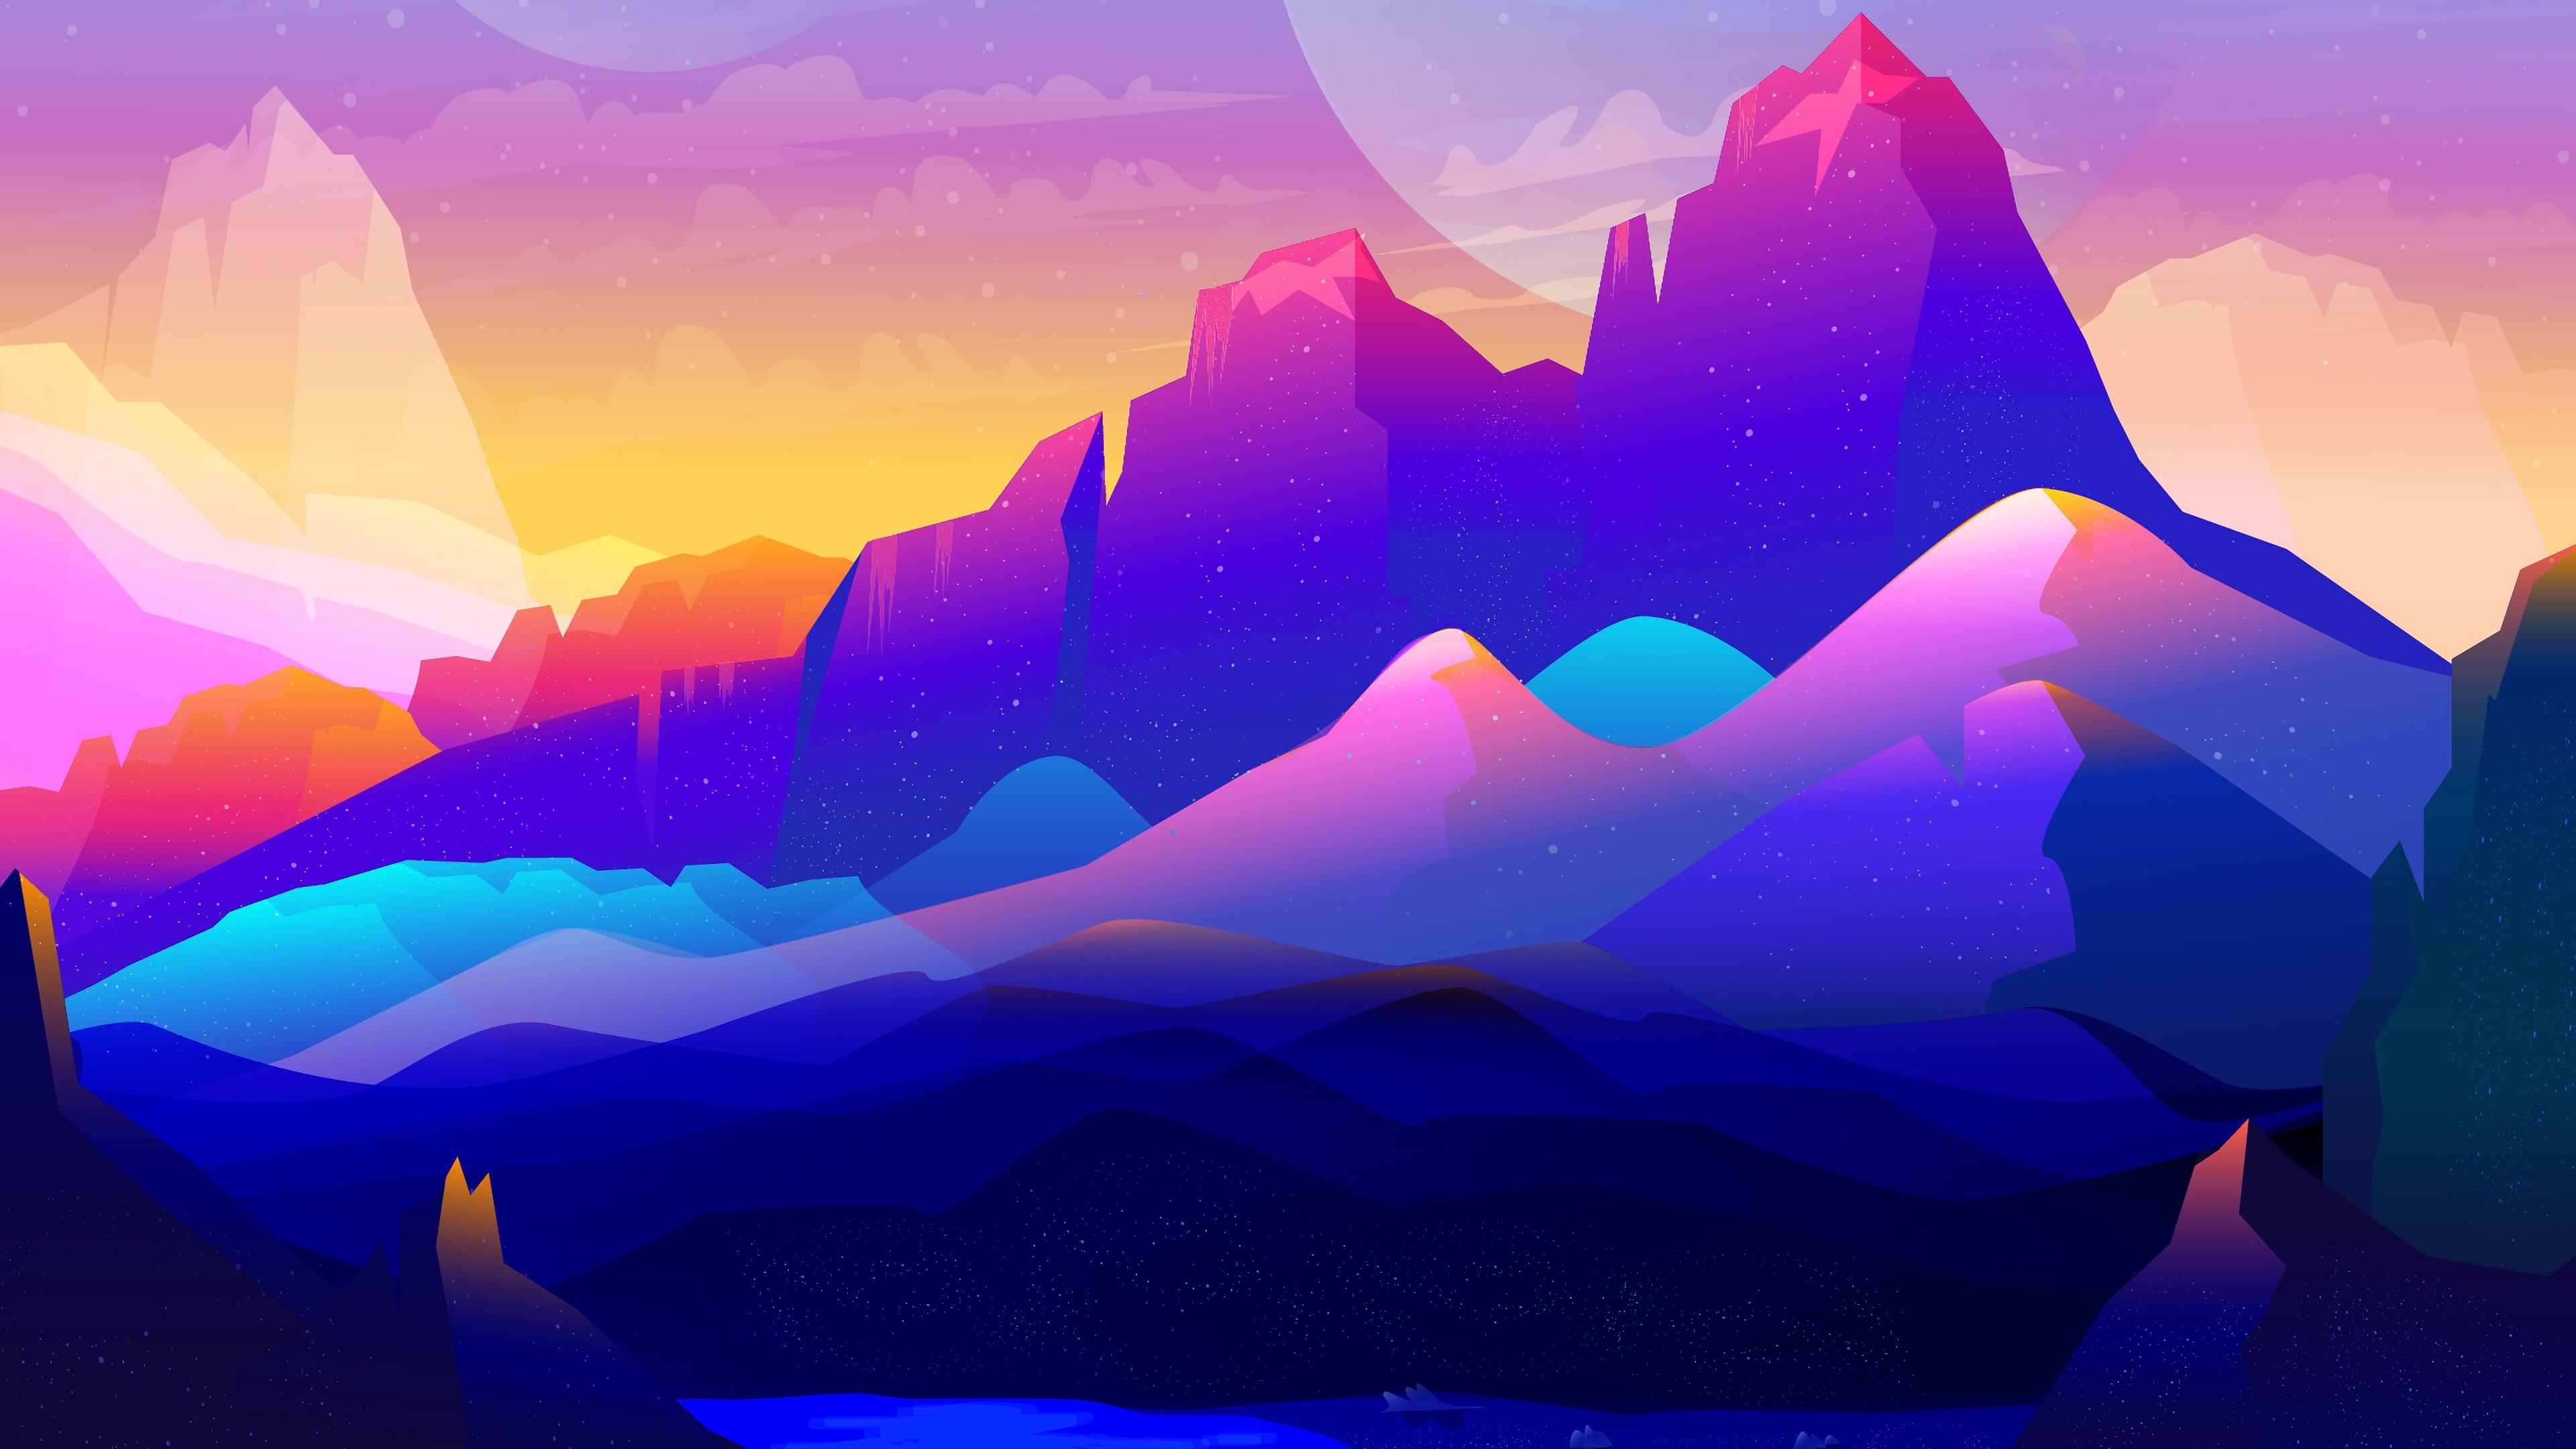 Minimalistic Landscape Wallpaper 1080p , HD Wallpaper & Backgrounds